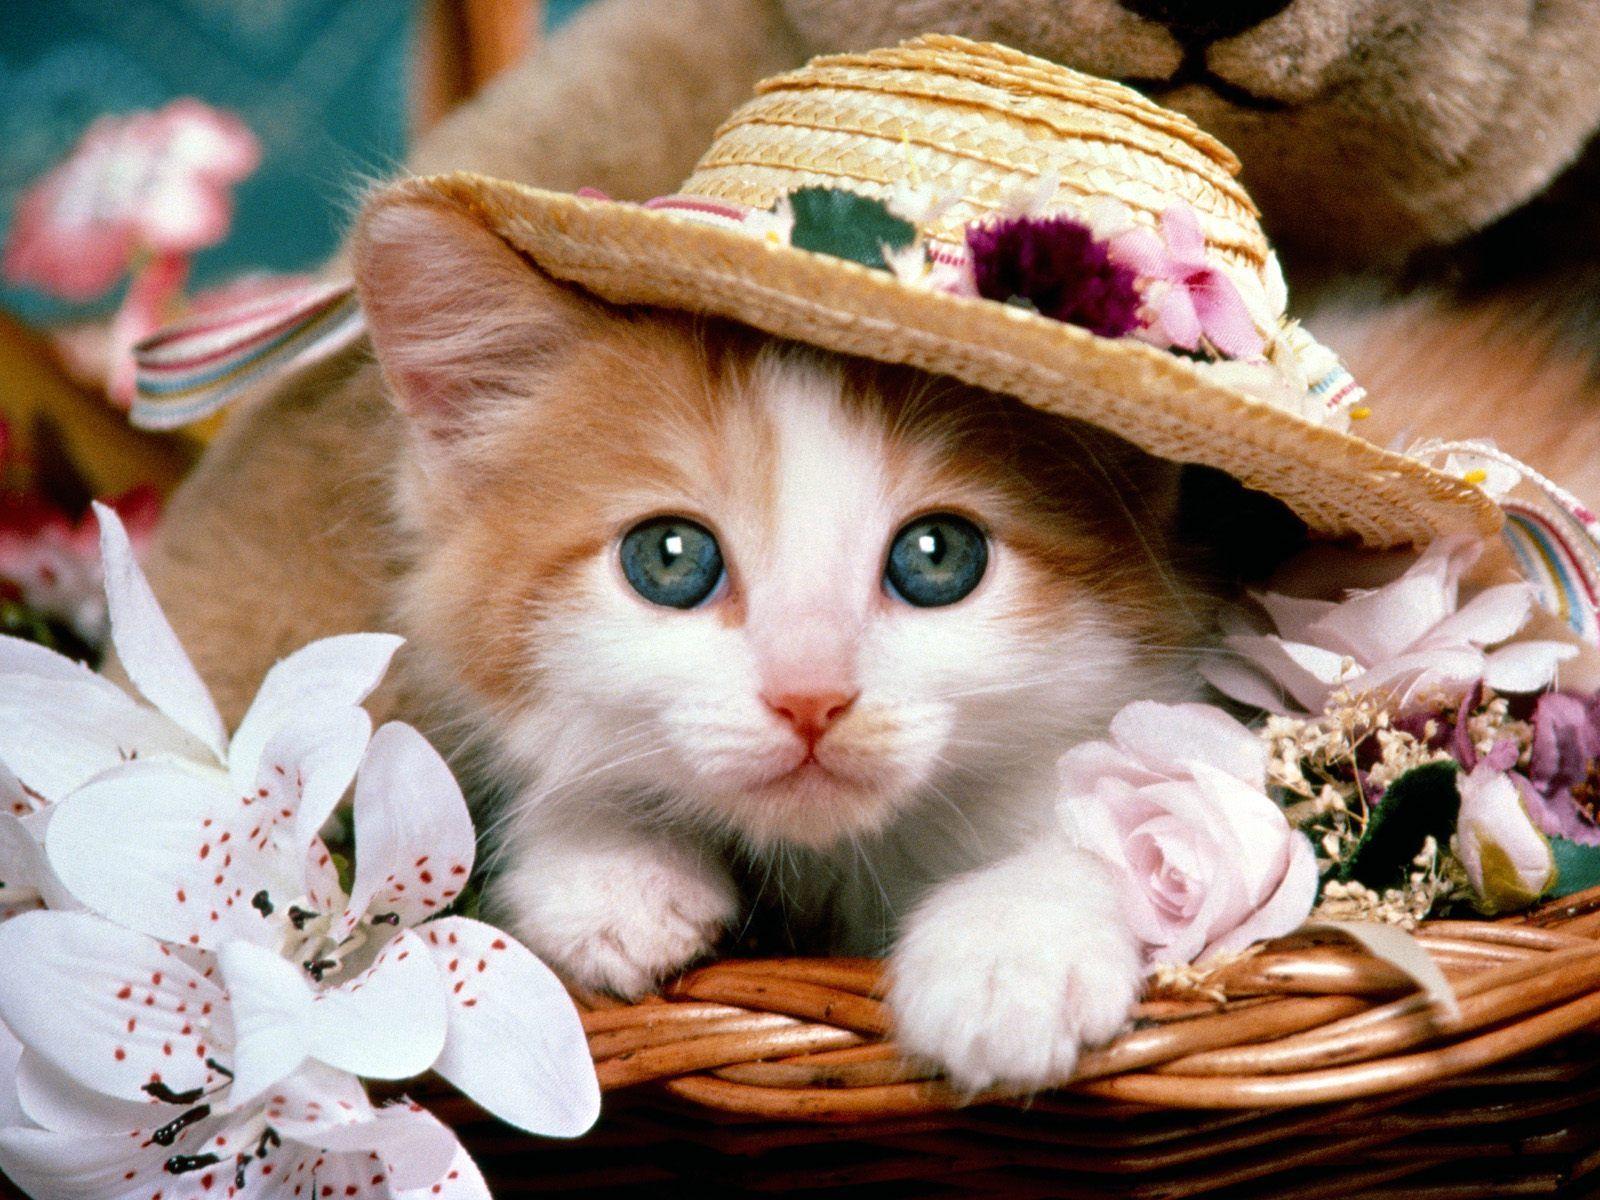 Competition For A Mischievous Face Under A Hat Gatos Tiernos Fotos Con Gatos Fotos De Gatitos Tiernos